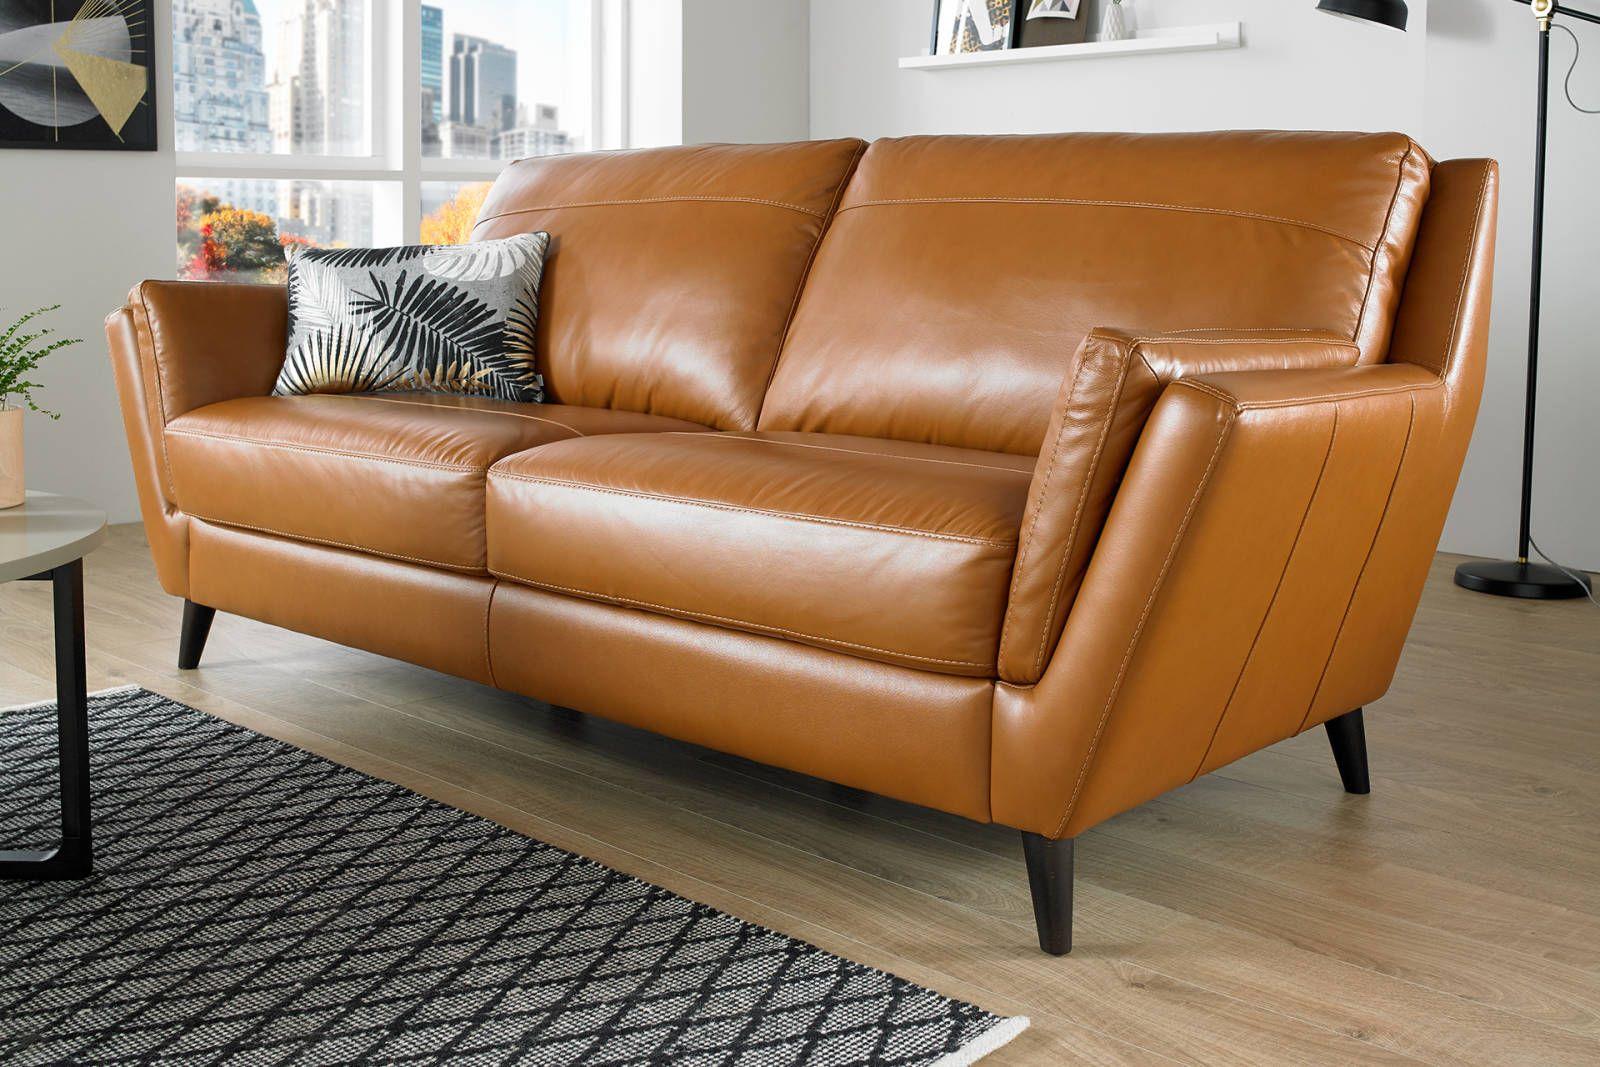 Outstanding Image Result For Leather Orange Brown Sofa Navy Living Spiritservingveterans Wood Chair Design Ideas Spiritservingveteransorg